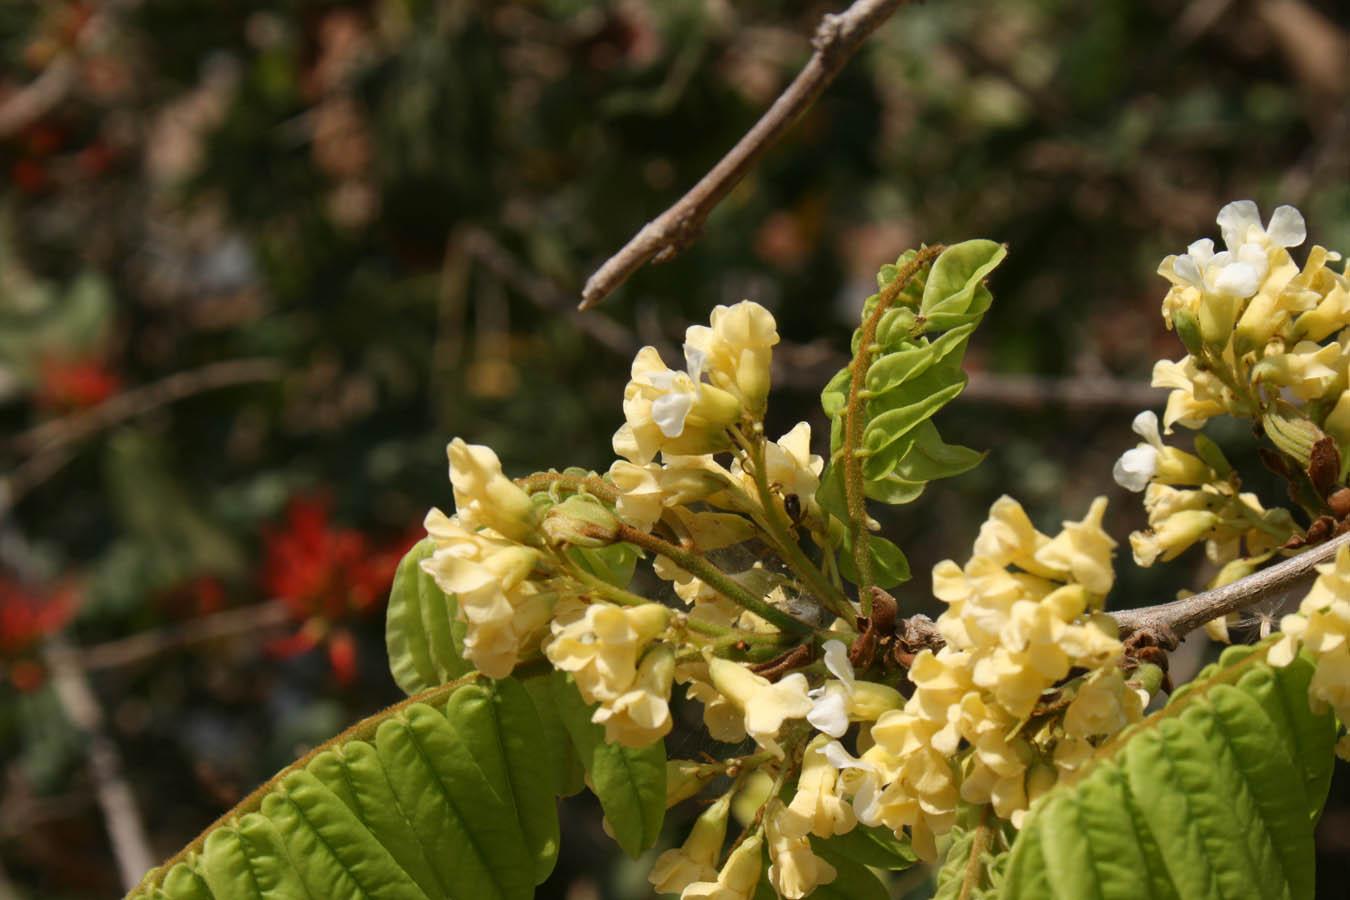 Dalbergia arbutifolia